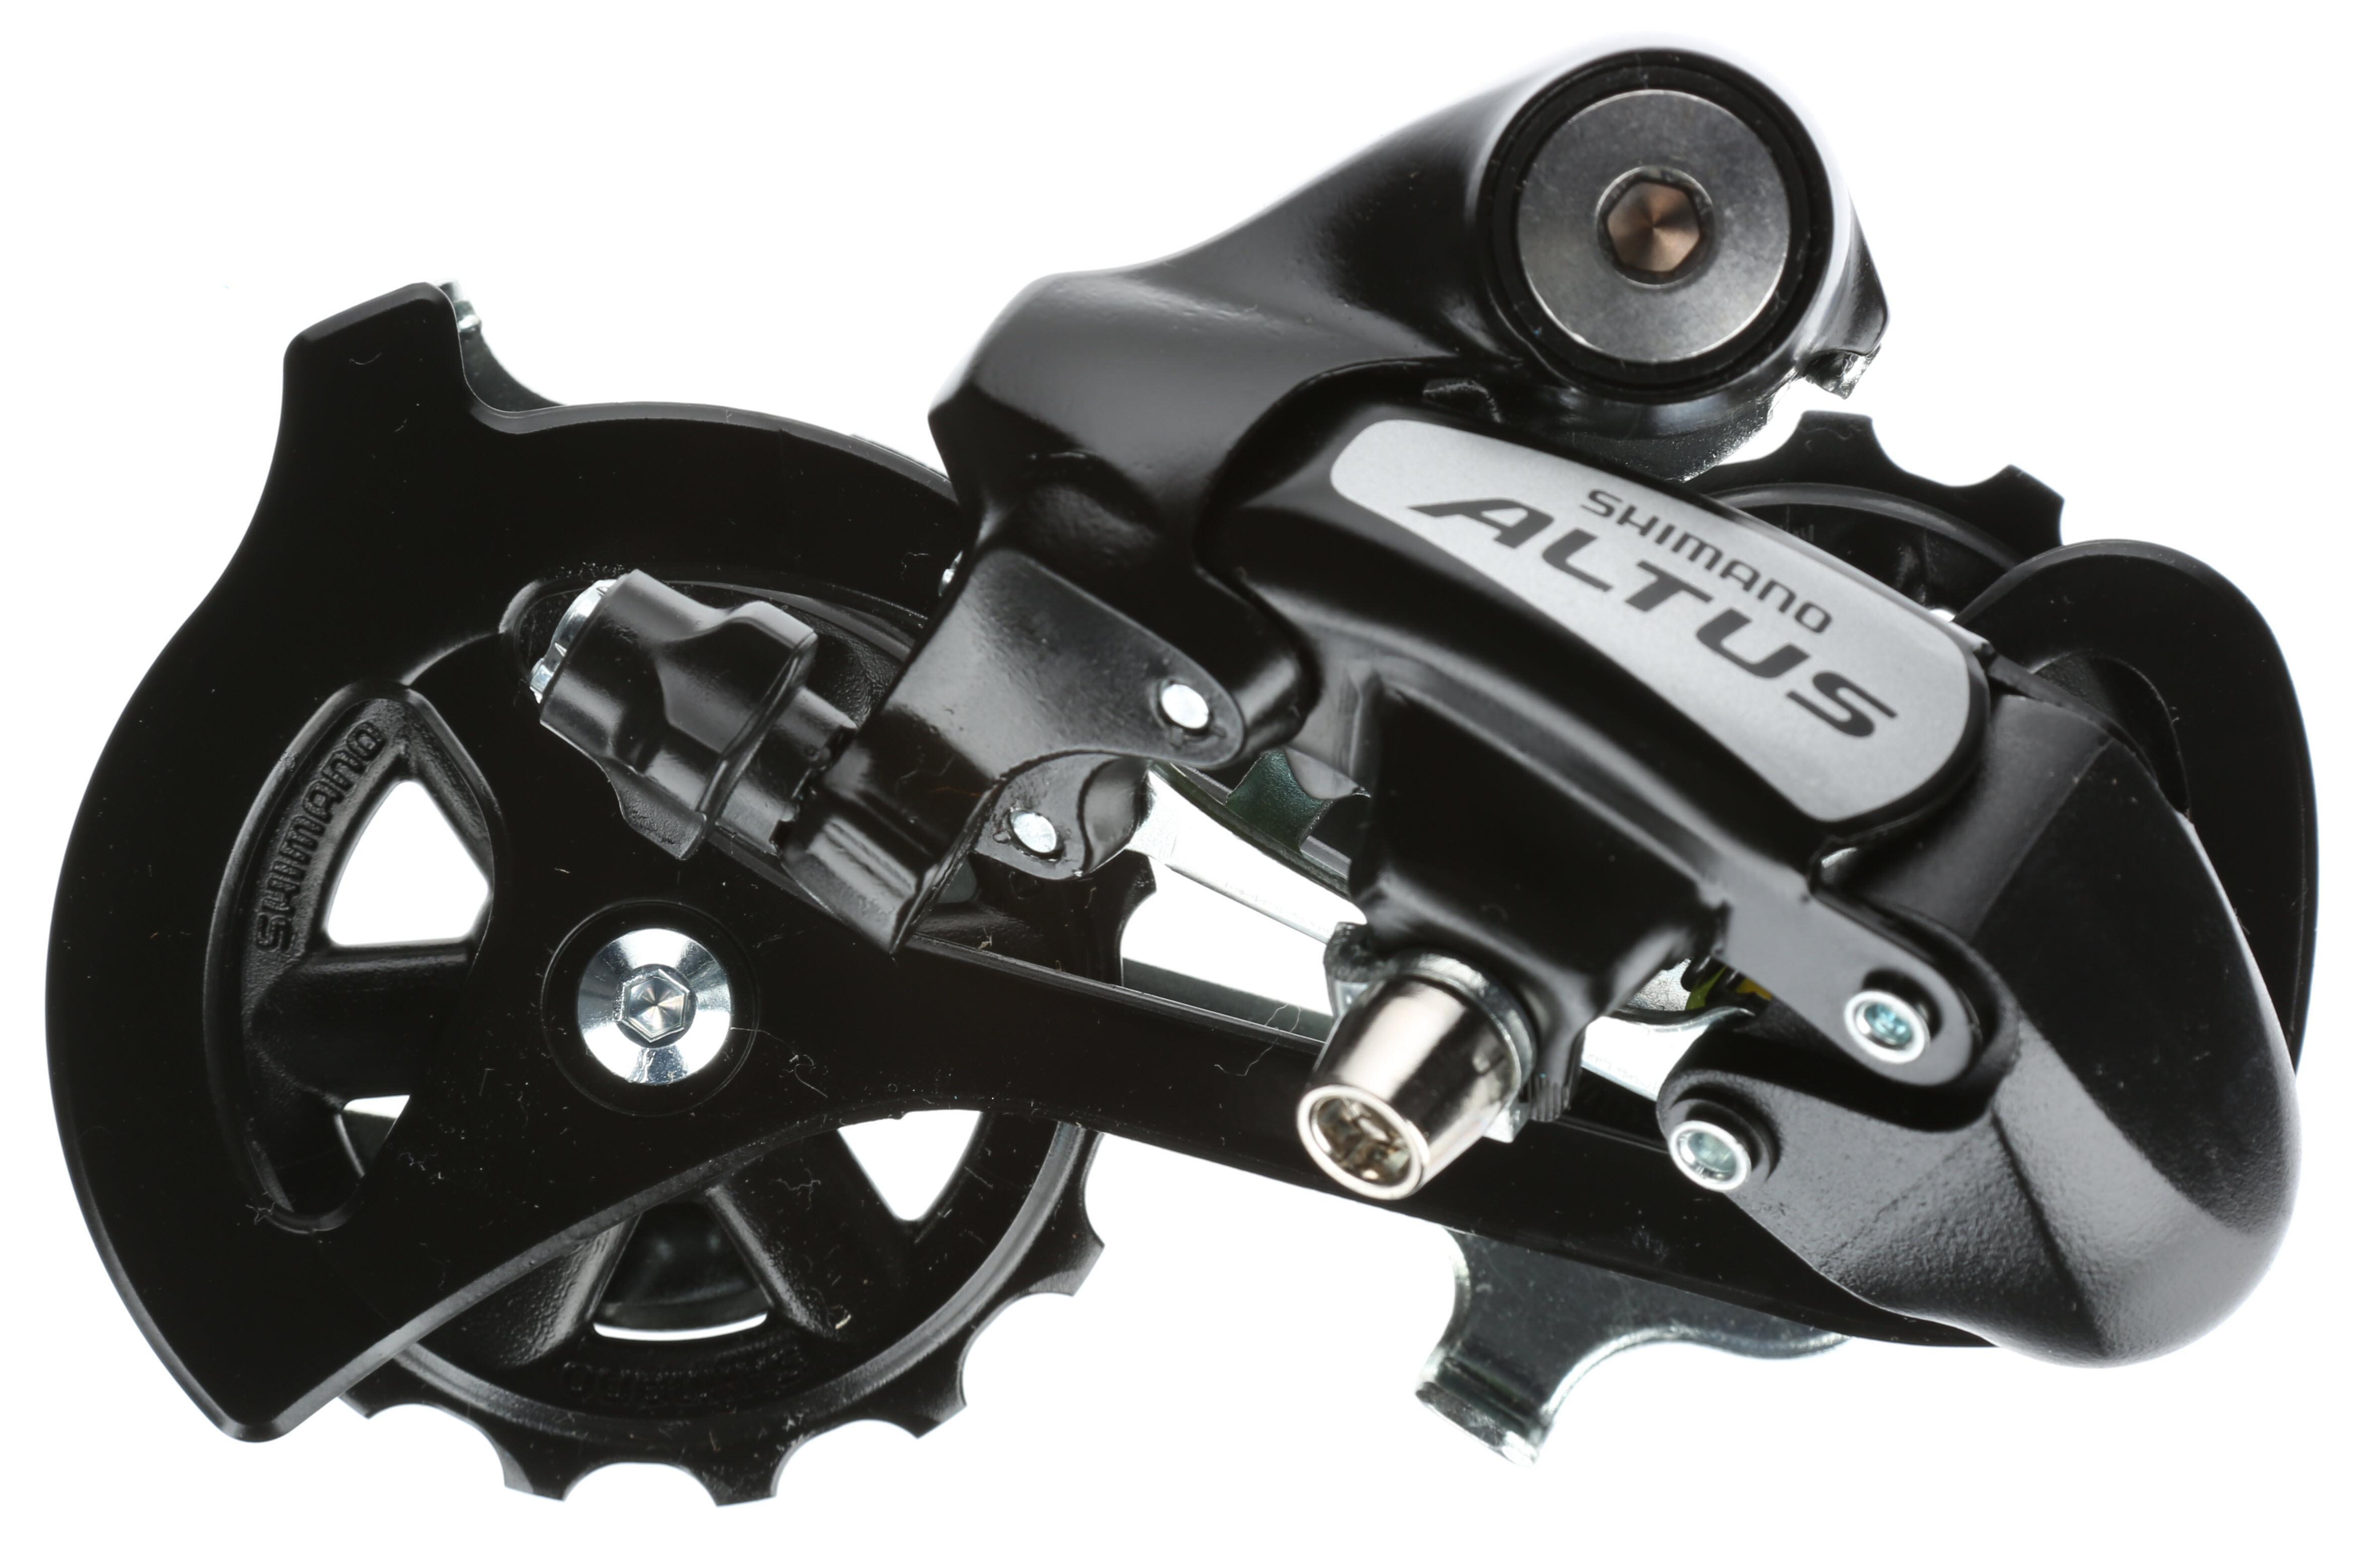 Details about  /RD-FT30 6//7 Speed Transmission Bicycle Parts Rear Derailleur Bicycle Derailleur